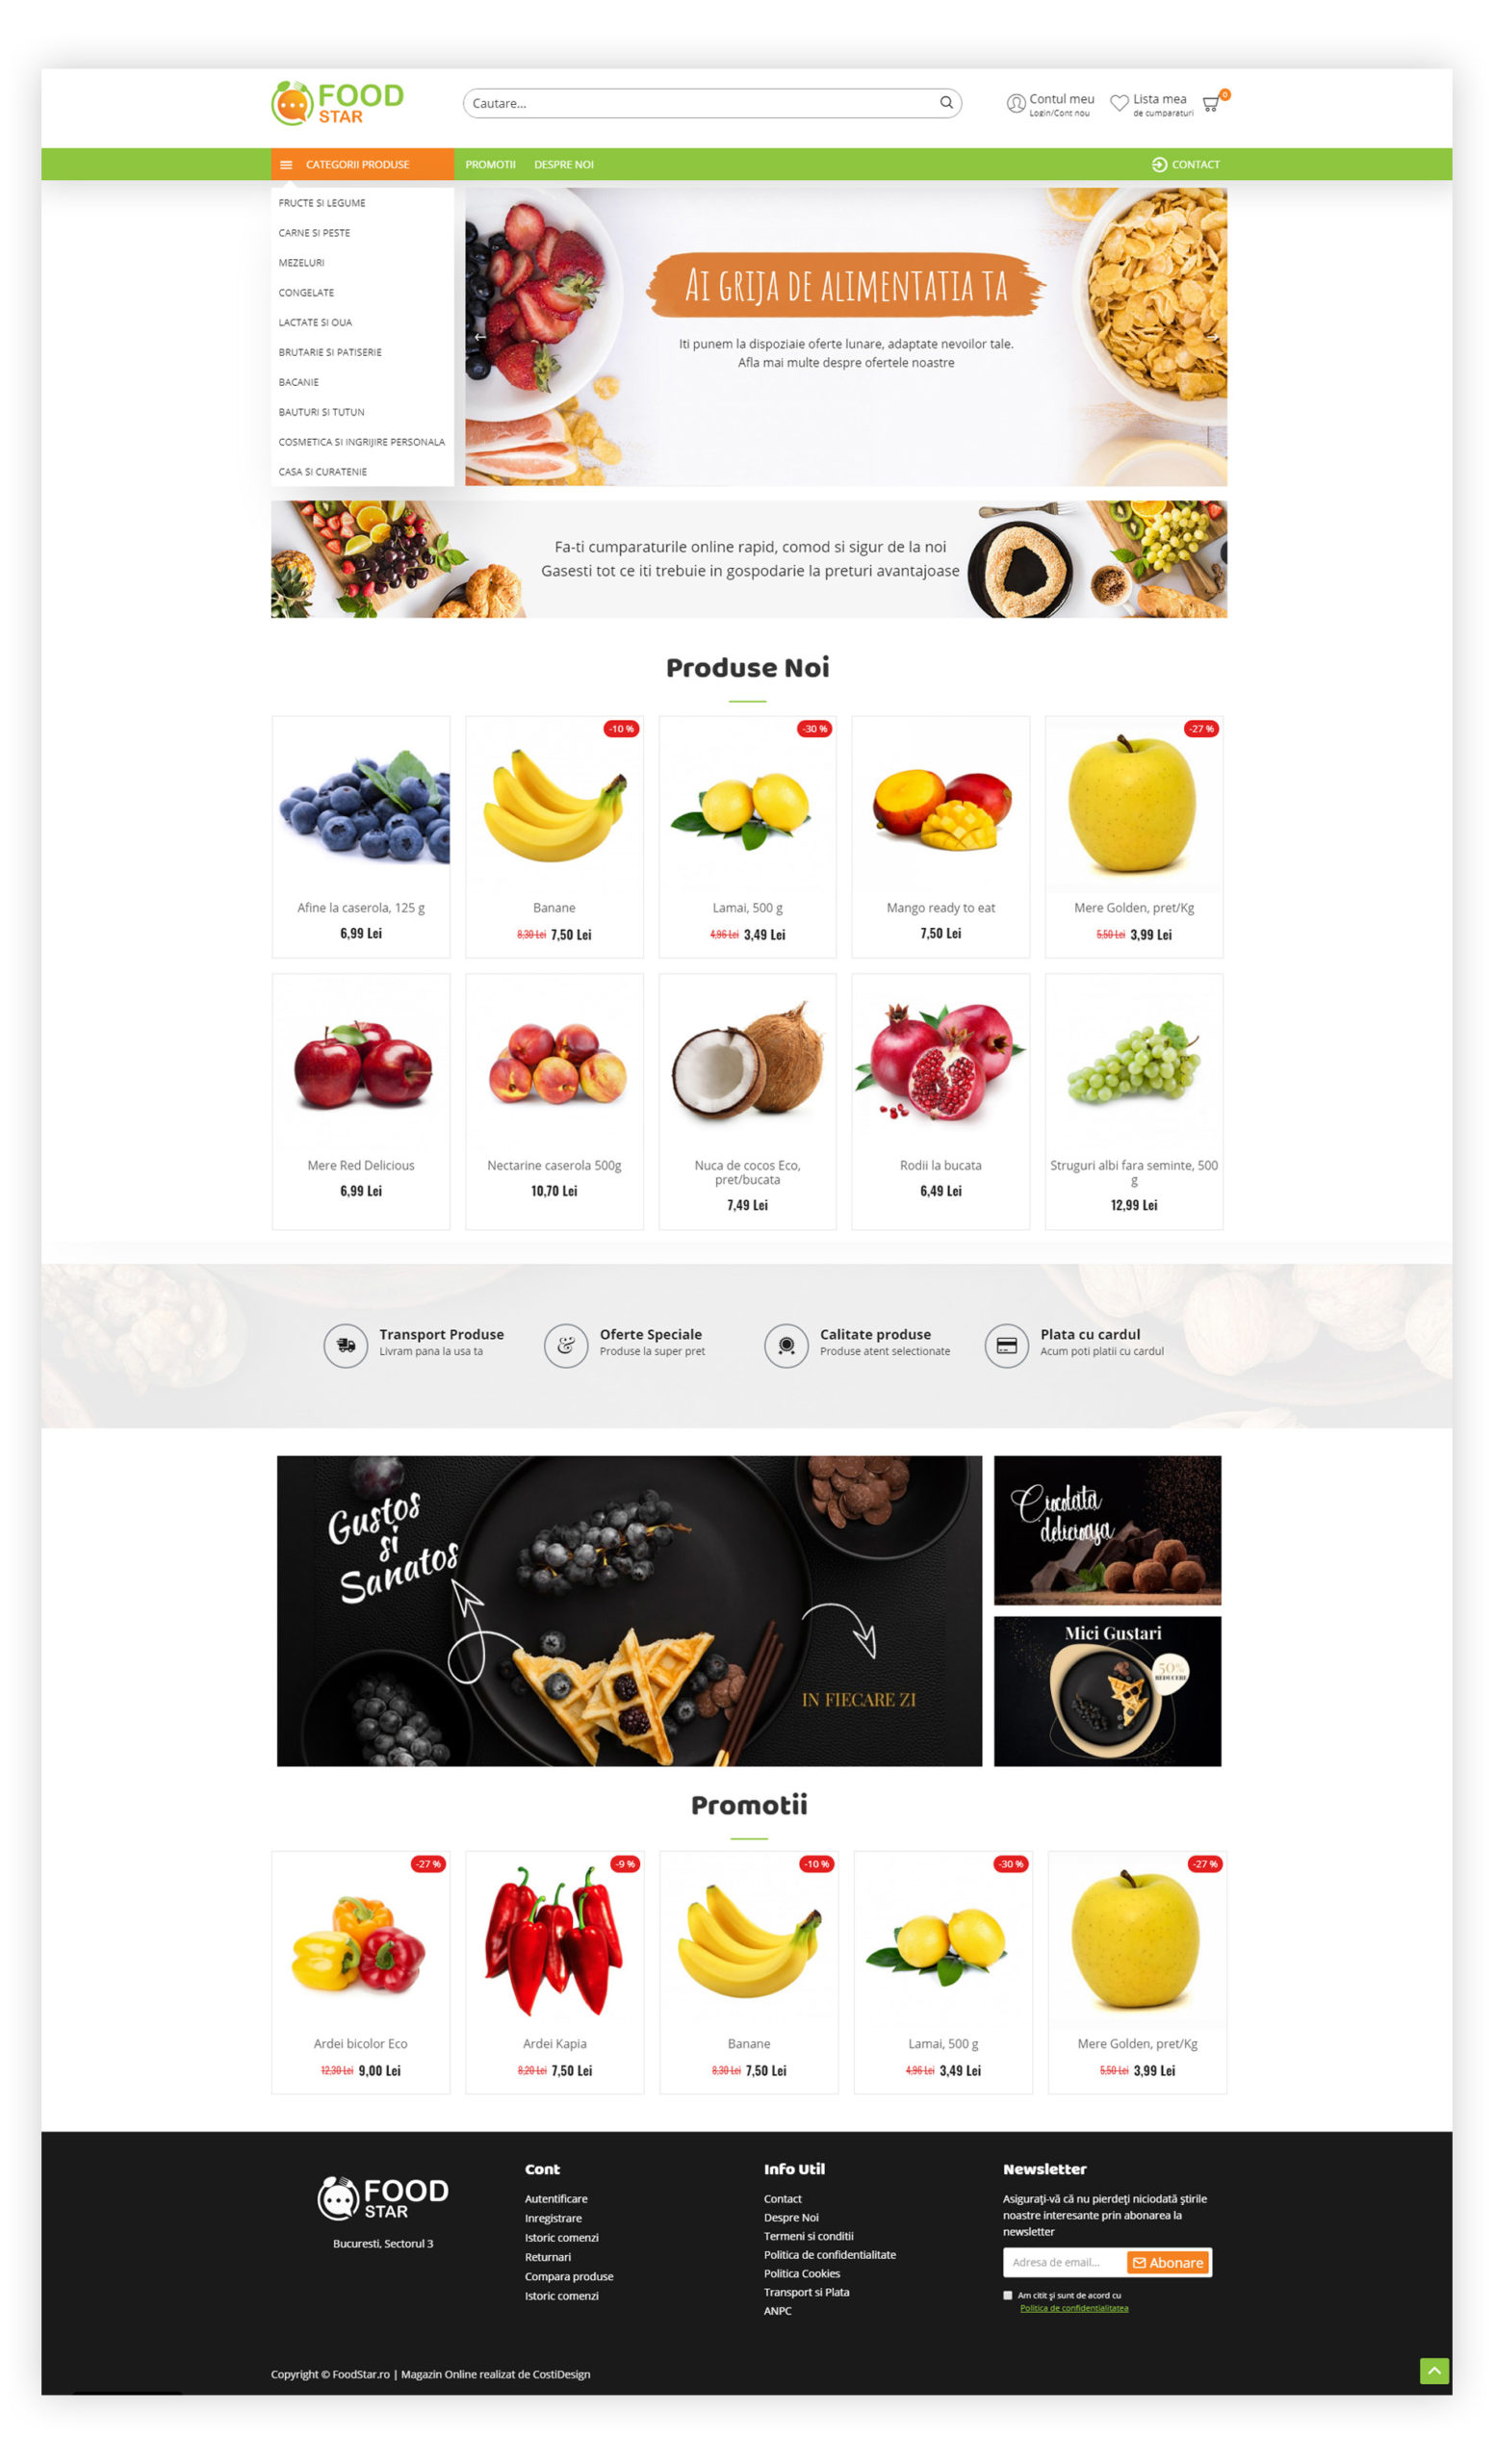 Sablon FoodStar